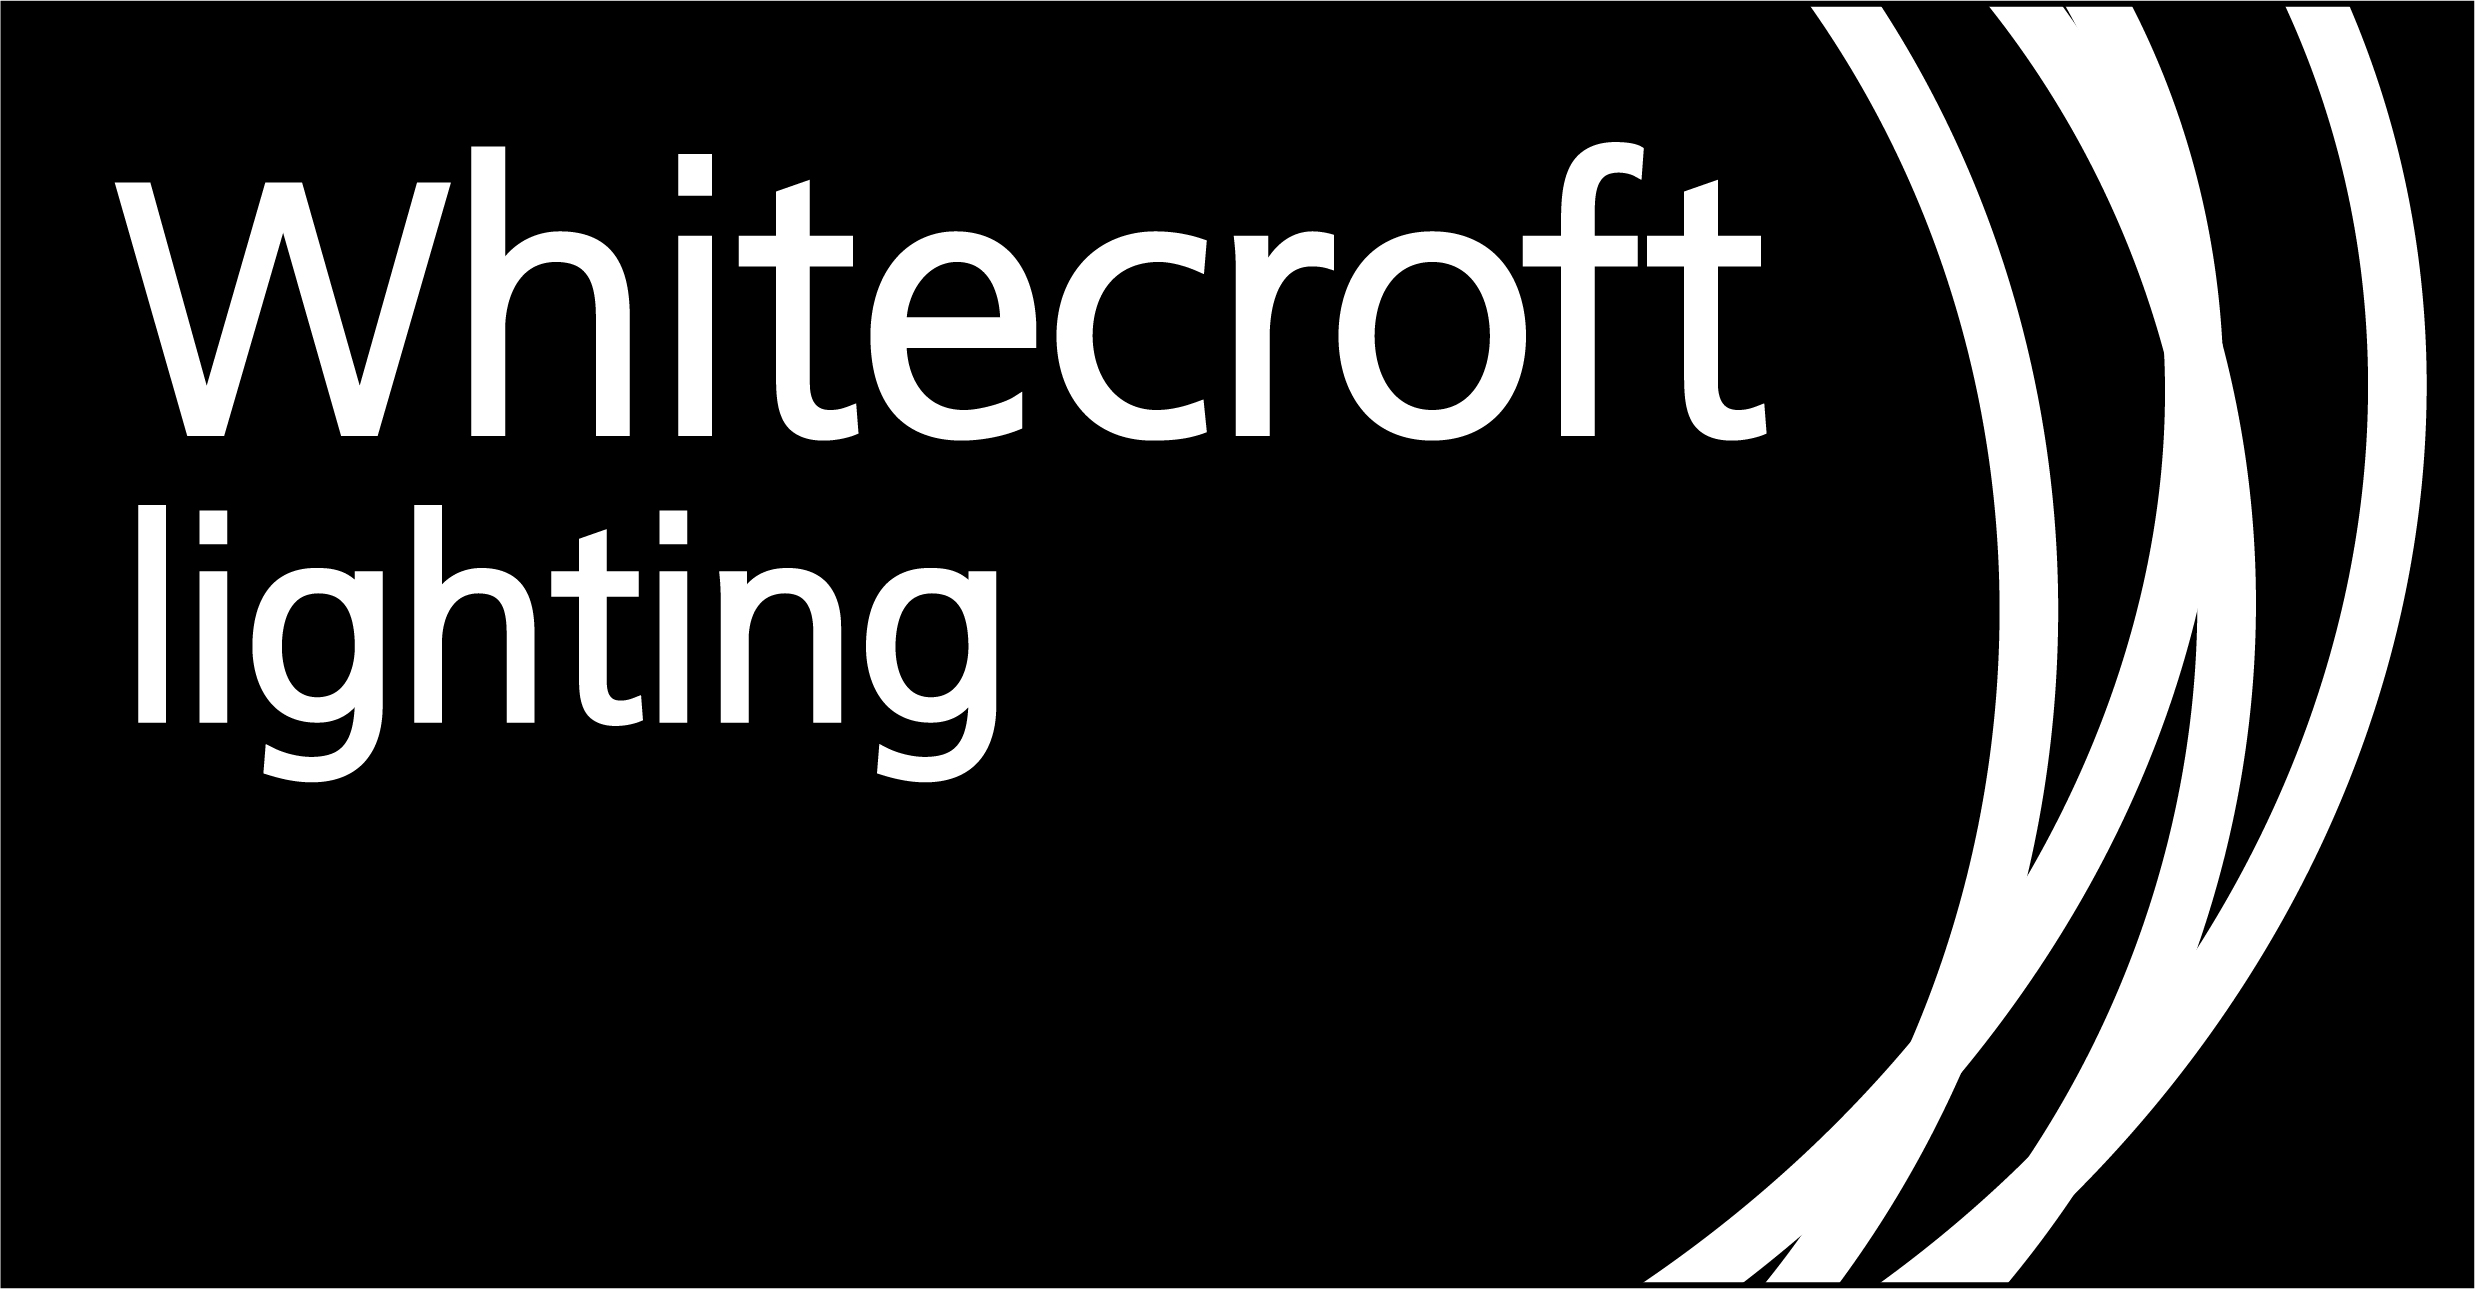 Whitecroft Lighting logo